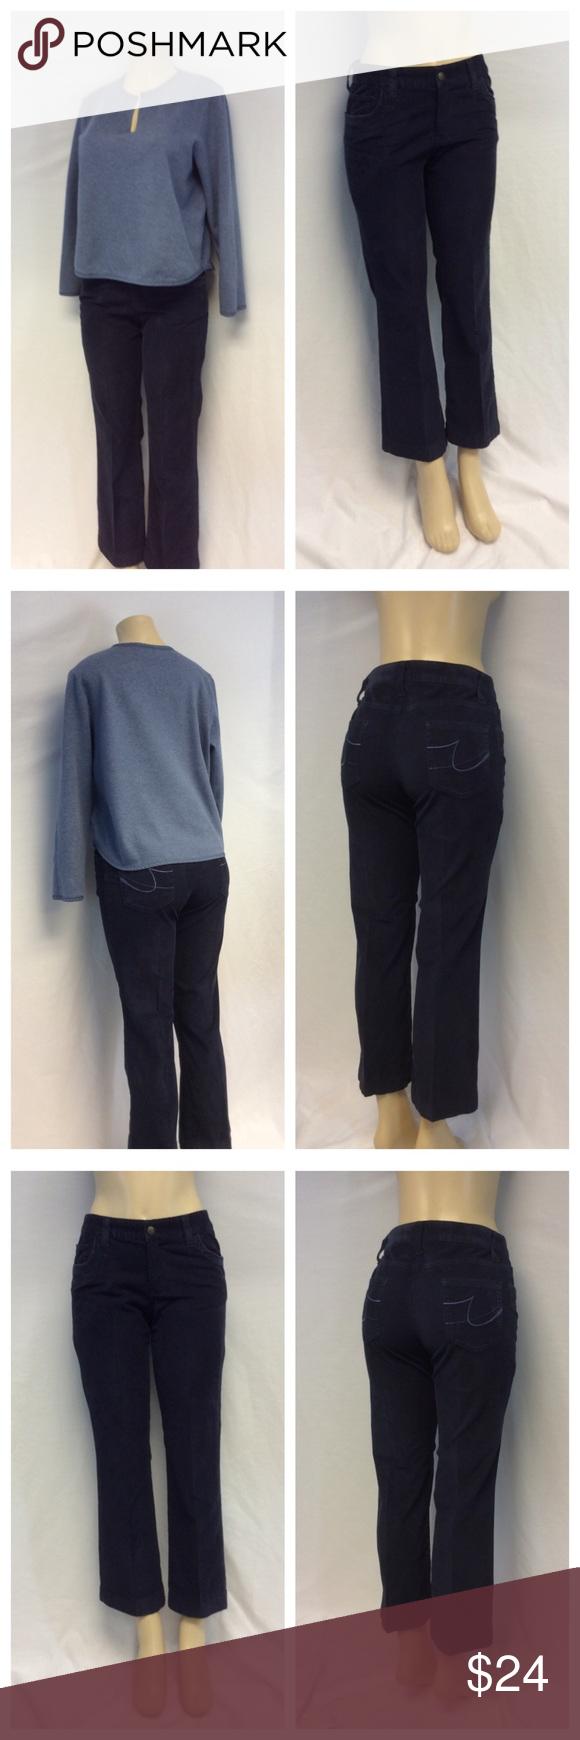 "IZOD STRETCH Black Corduroy Pants IZOD STRETCH Black Corduroy Pants, Size 8, 97% cotton, 3% spandex, machine wash. Approximate measurements are 16"" waist laying flat, 27"" inseam, 37"" waist to hem, 9"" waist to crotch, 4"" zipper. 0134 Izod Pants"